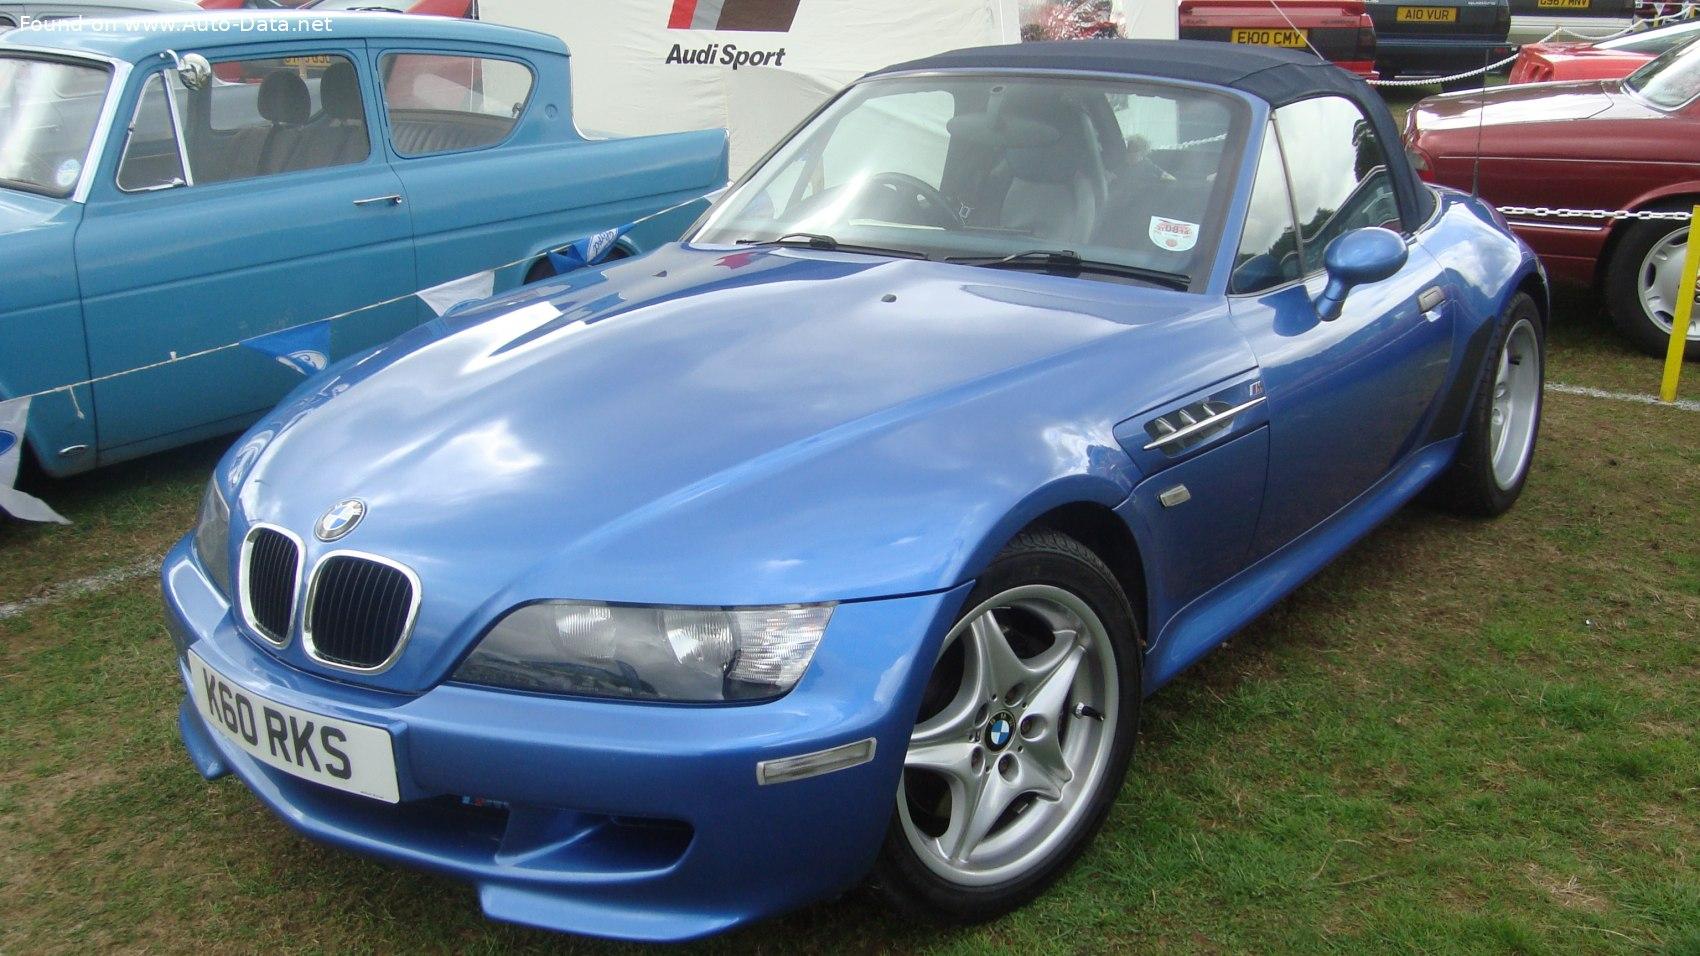 1997 Bmw Z3 M E36 7 3 2 325 Hp Technical Specs Data Fuel Consumption Dimensions